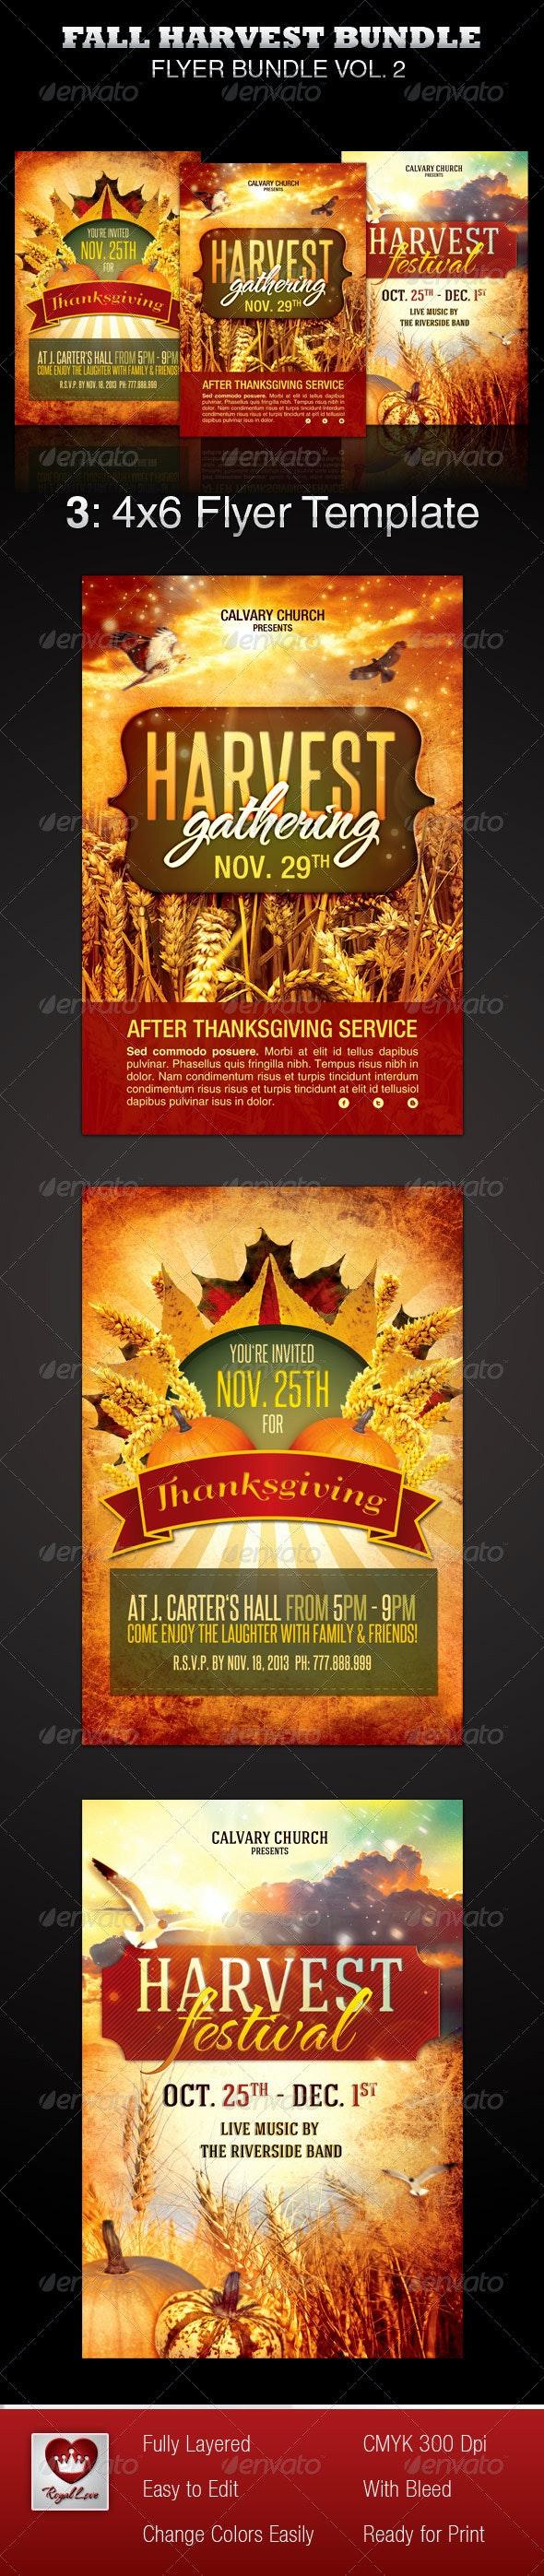 Fall Harvest Flyer Template Bundle - Church Flyers